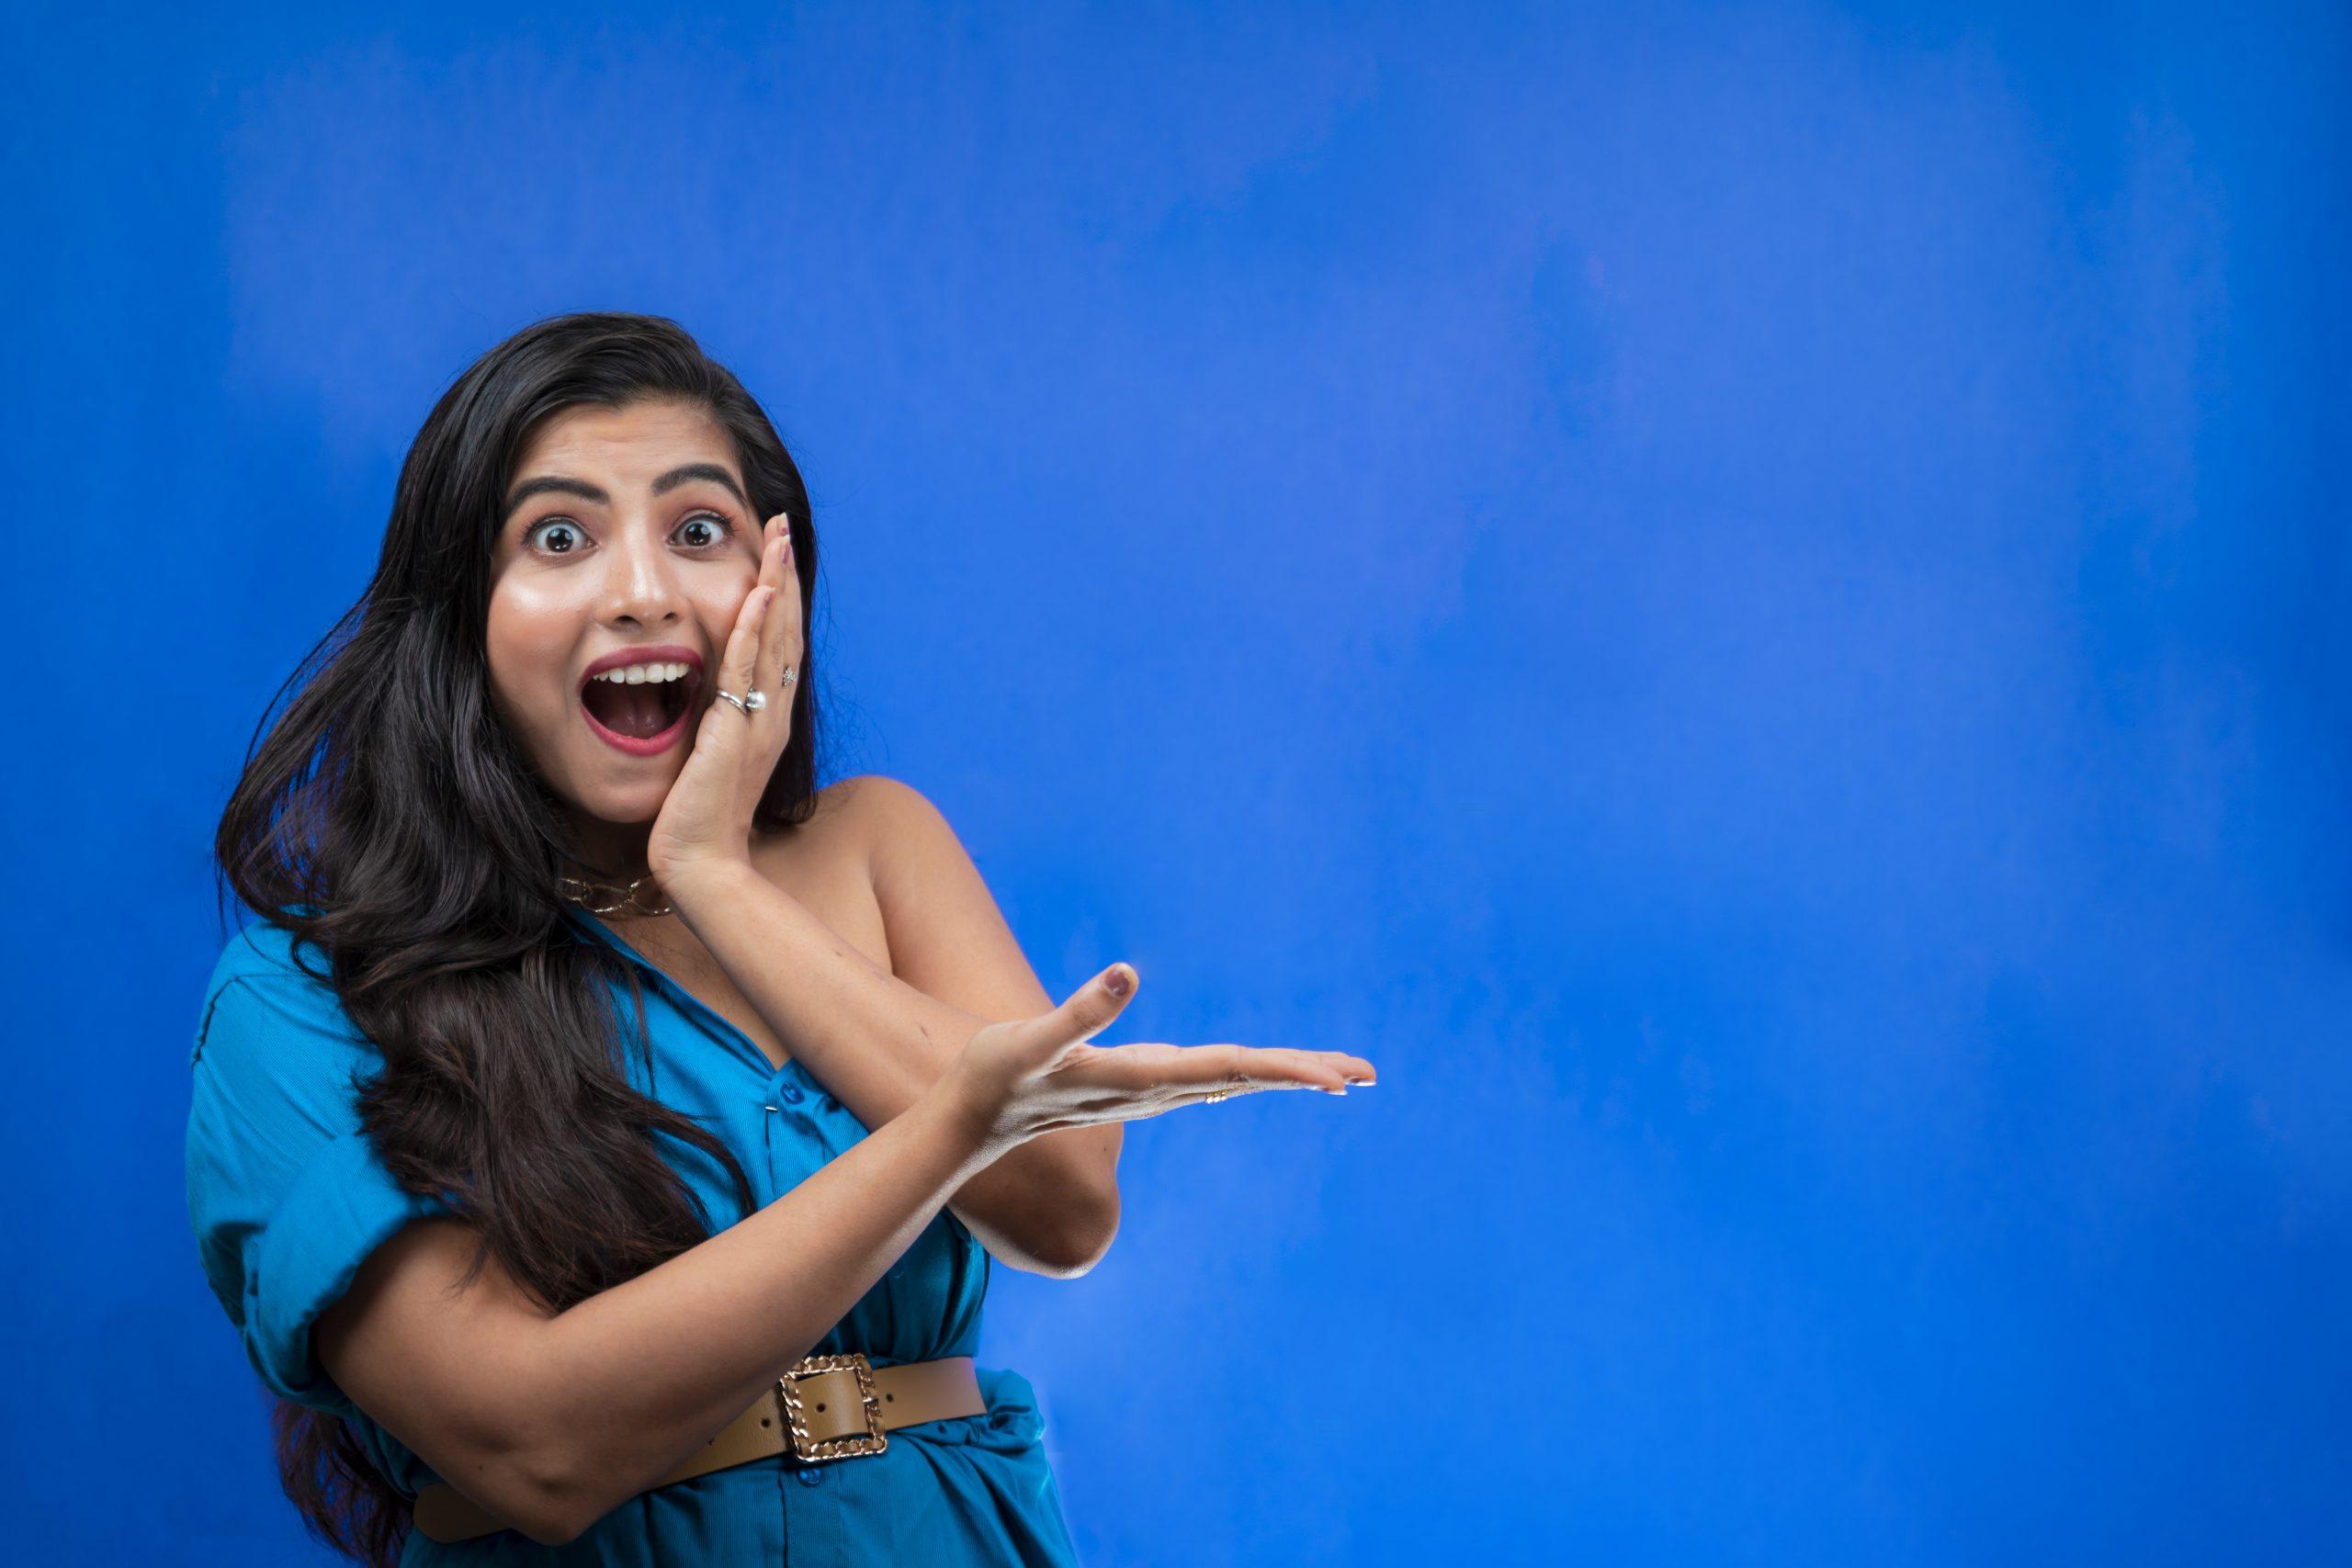 Shocked Indian Girl on Blue Background